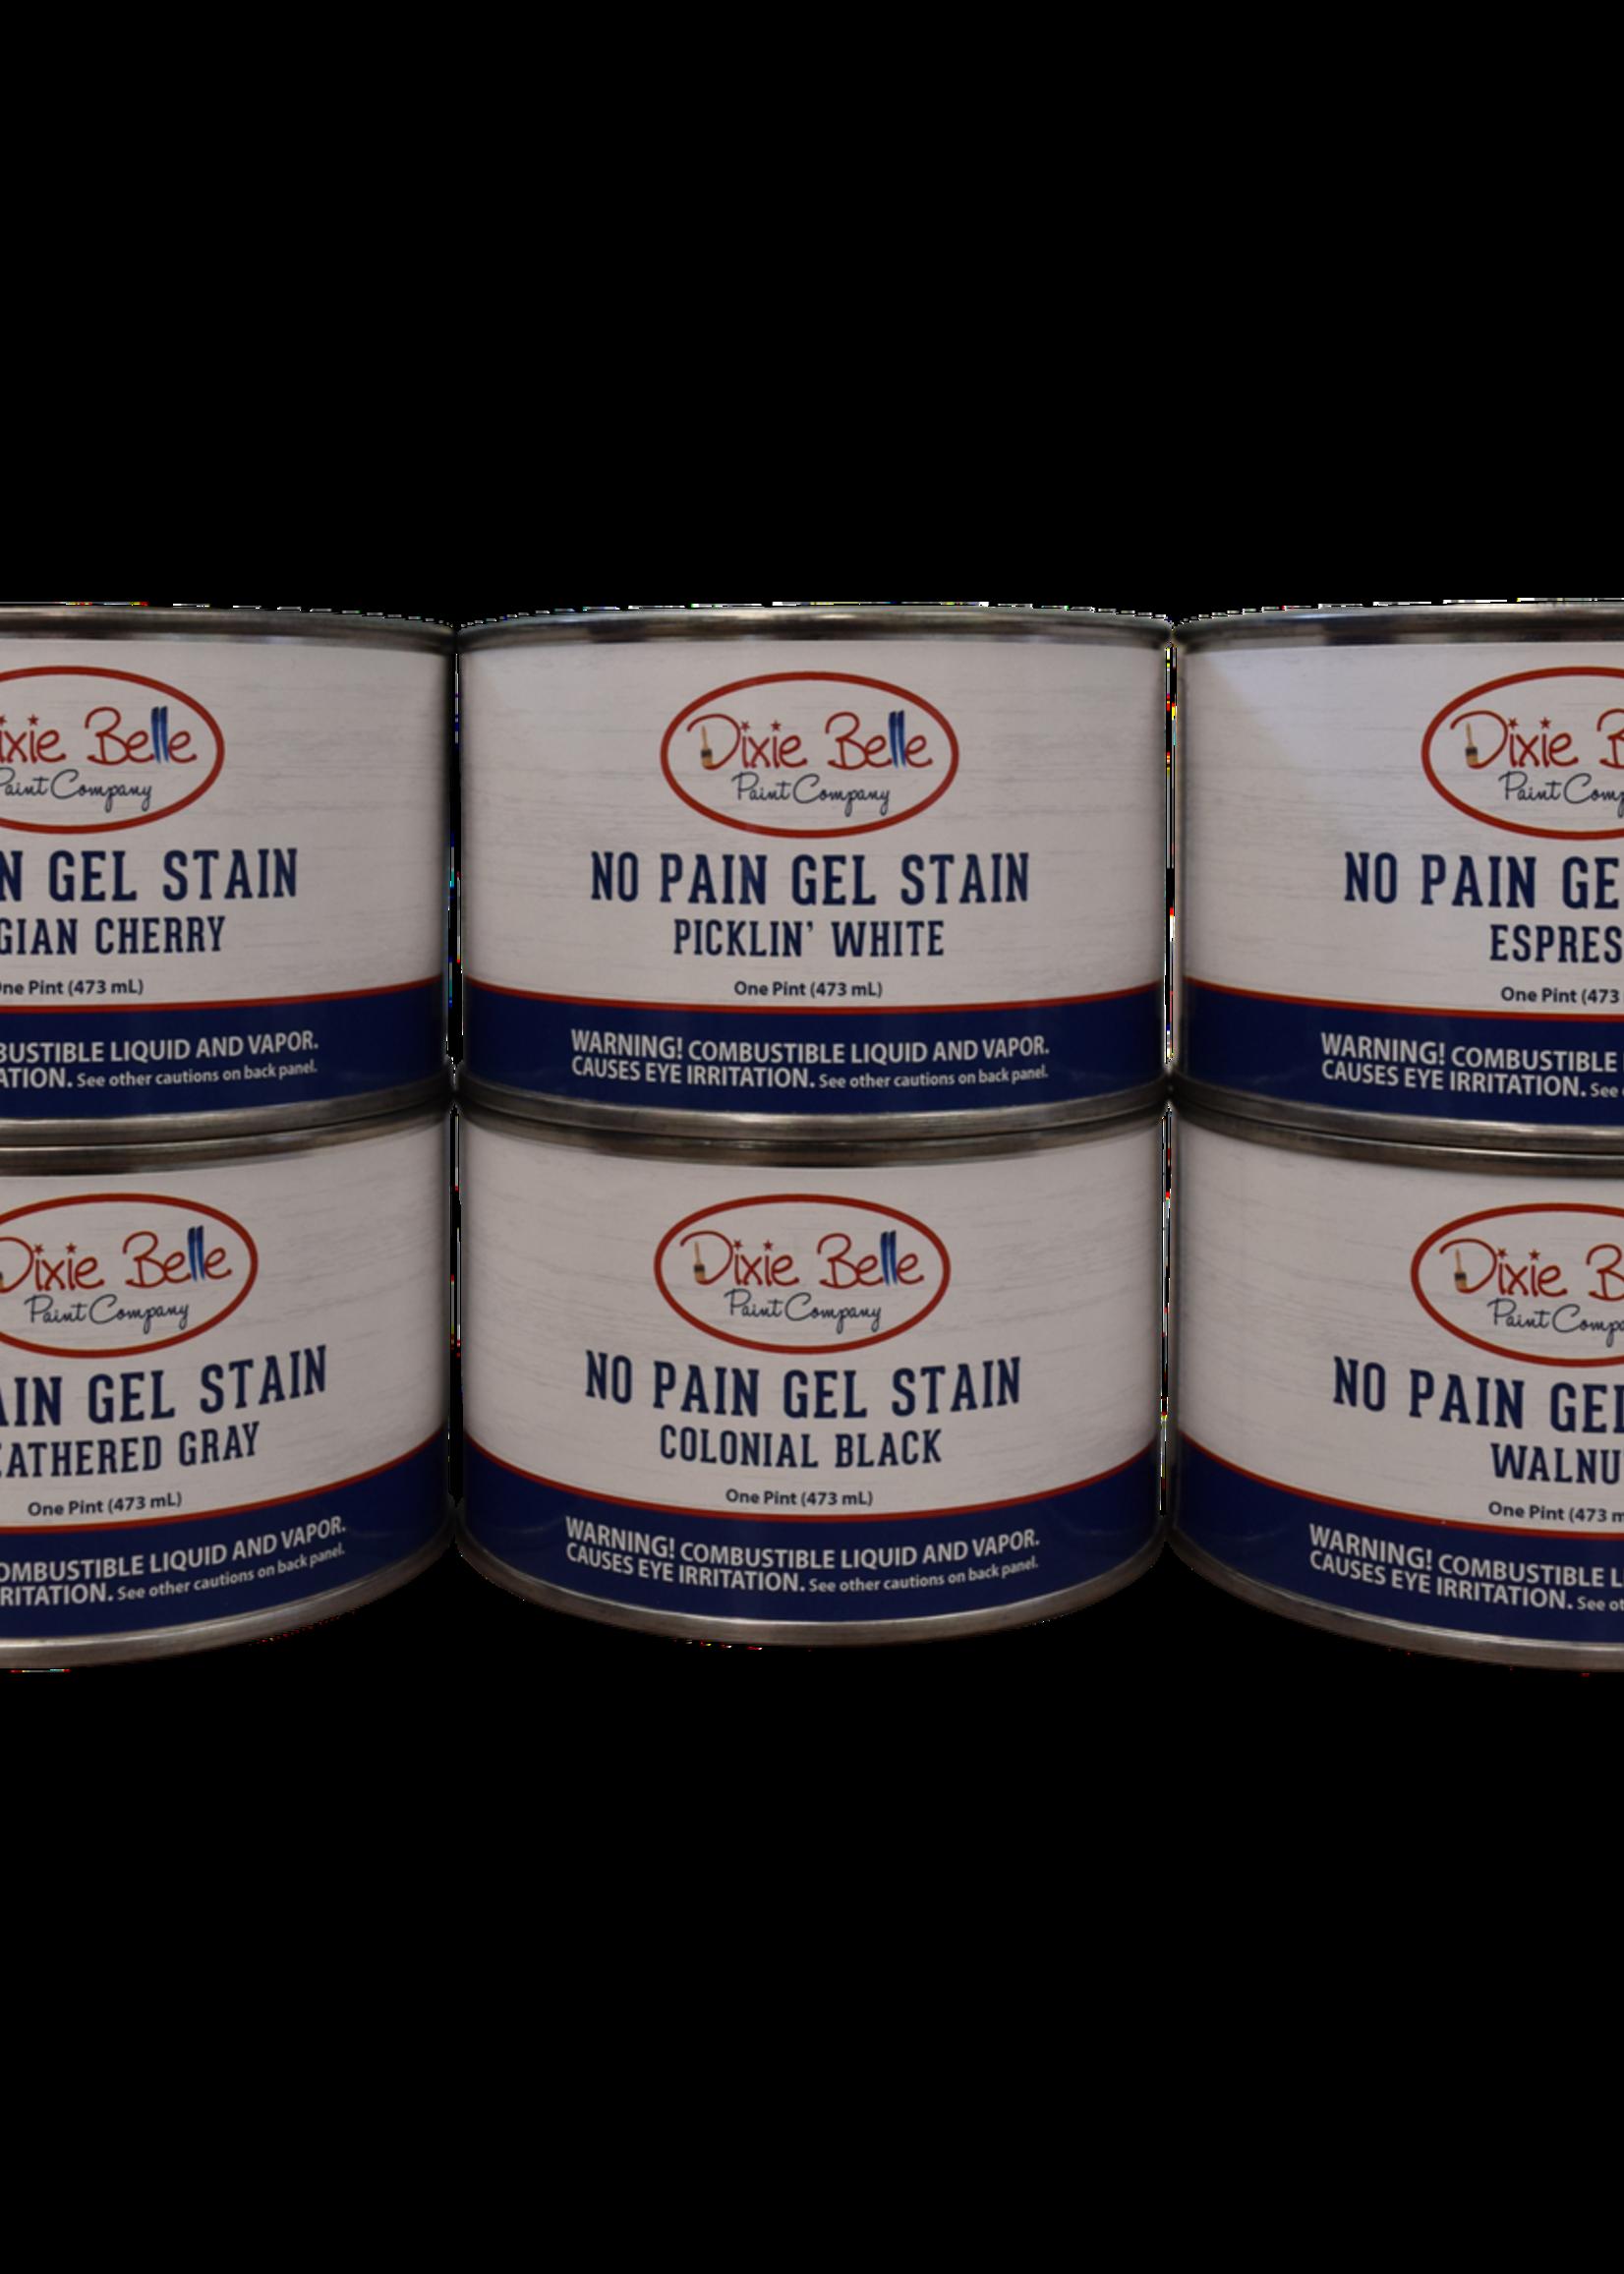 No Pain Gel Stain Georgian Cherry 16 oz